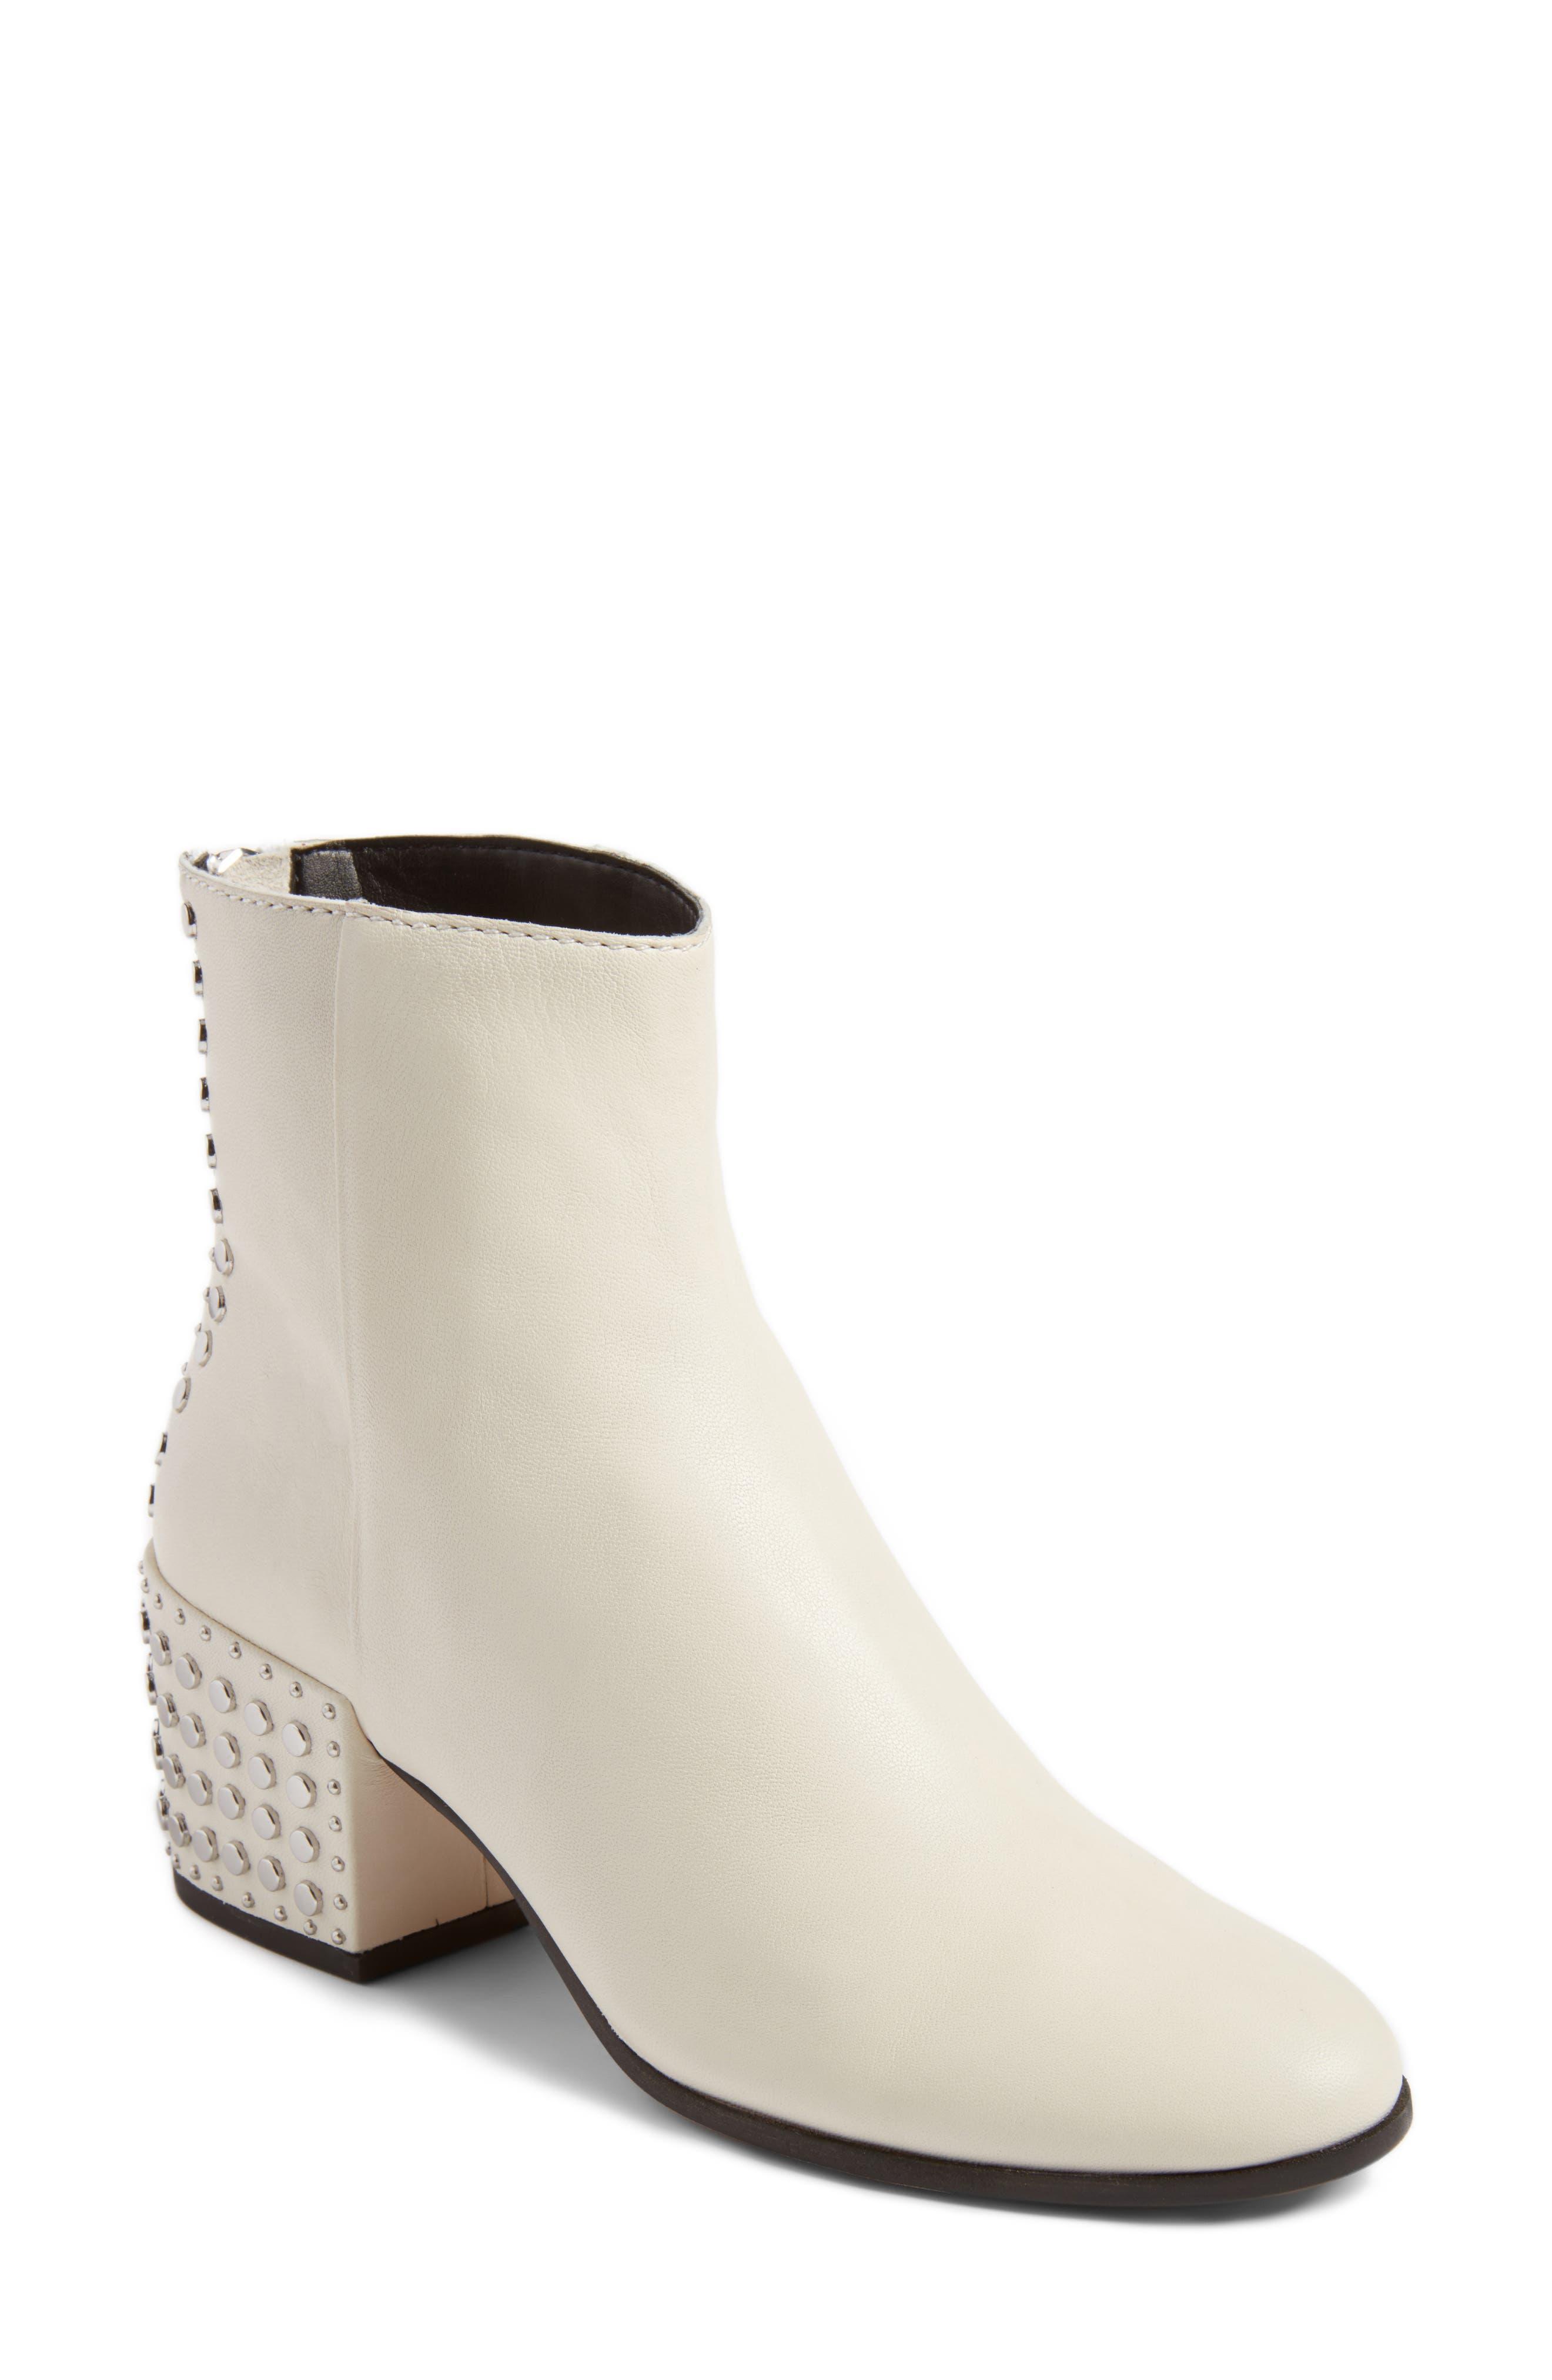 Main Image - Dolce Vita Mazey Block Heel Bootie (Women)